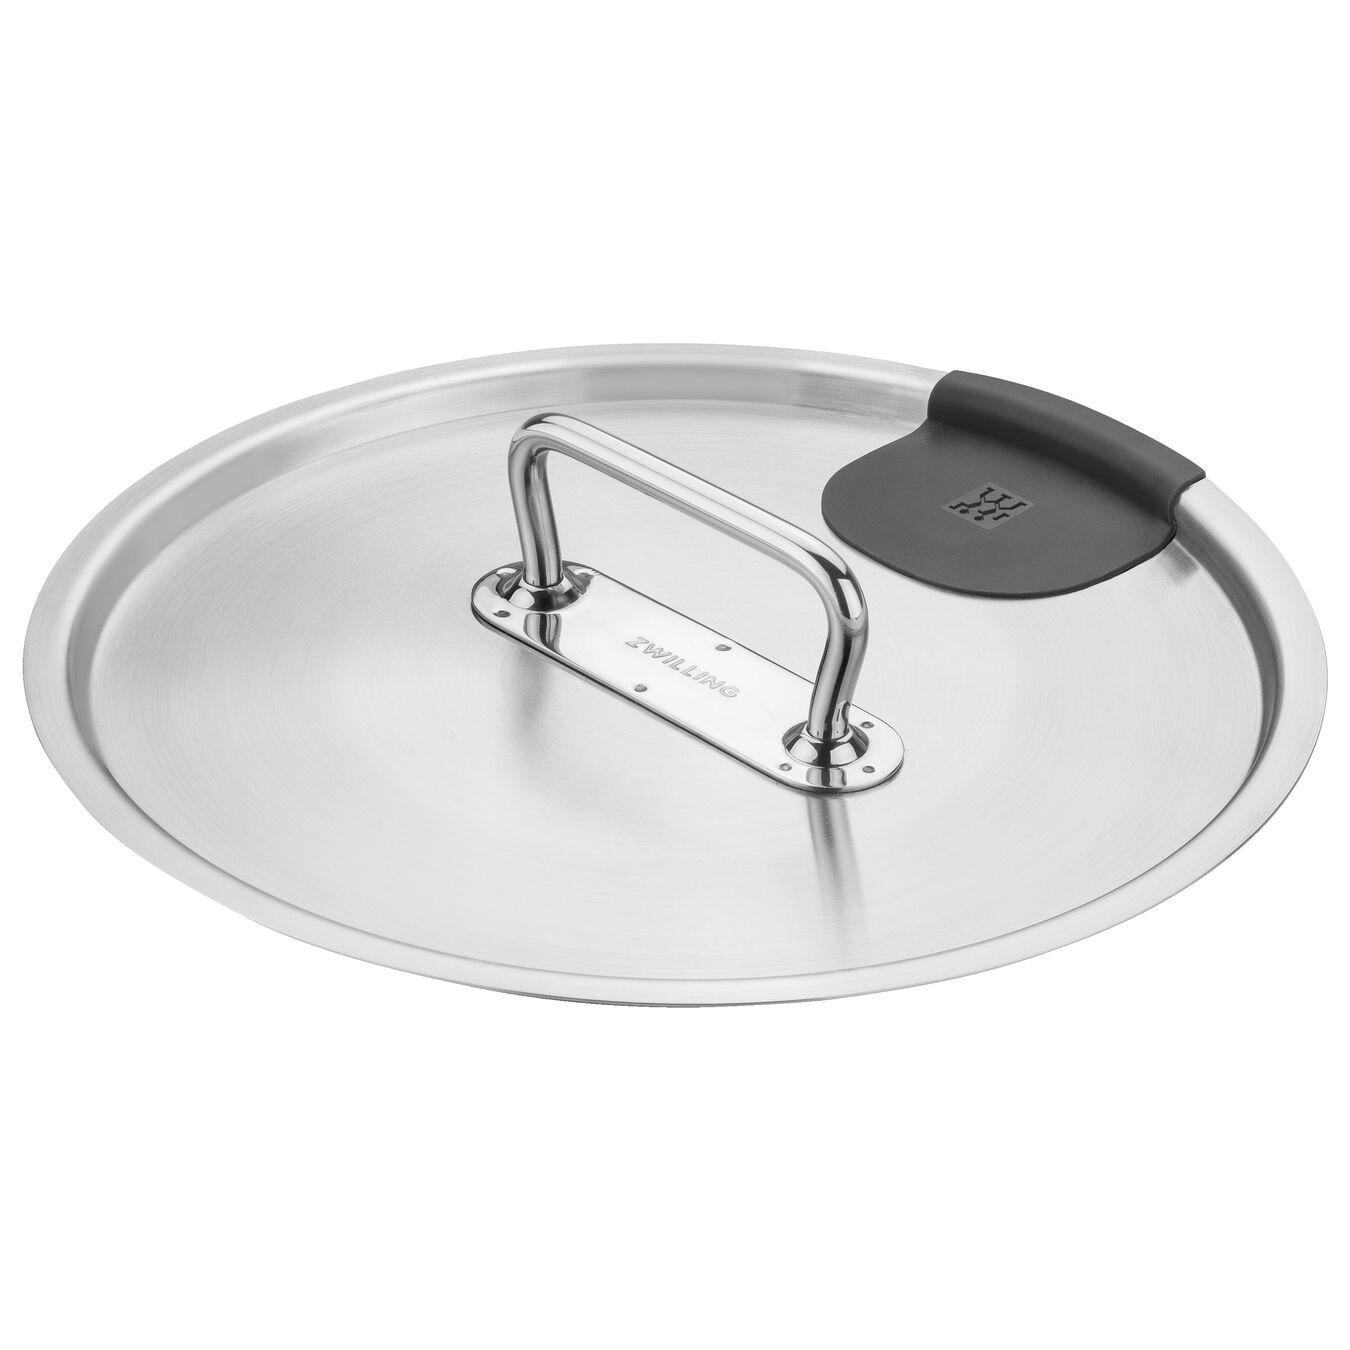 coperchio per cottura a bassa temperatura 24 cm, 18/10 acciaio inossidabile,,large 1